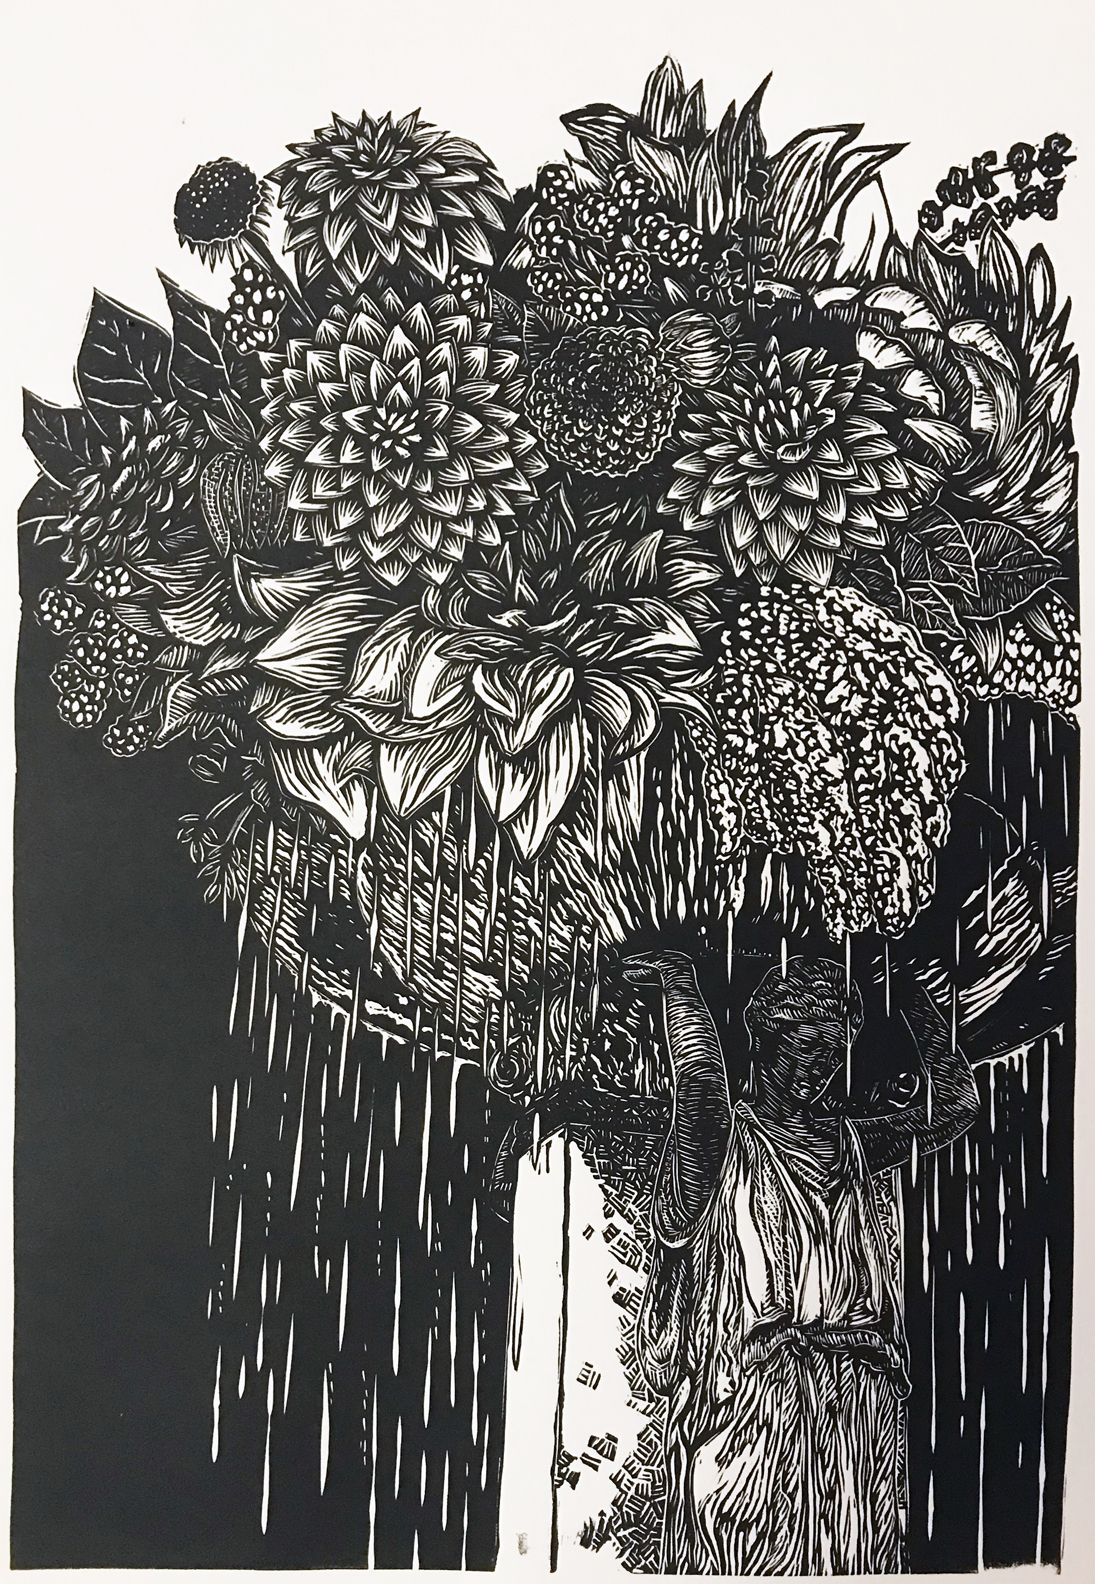 Skidmore Bouquet